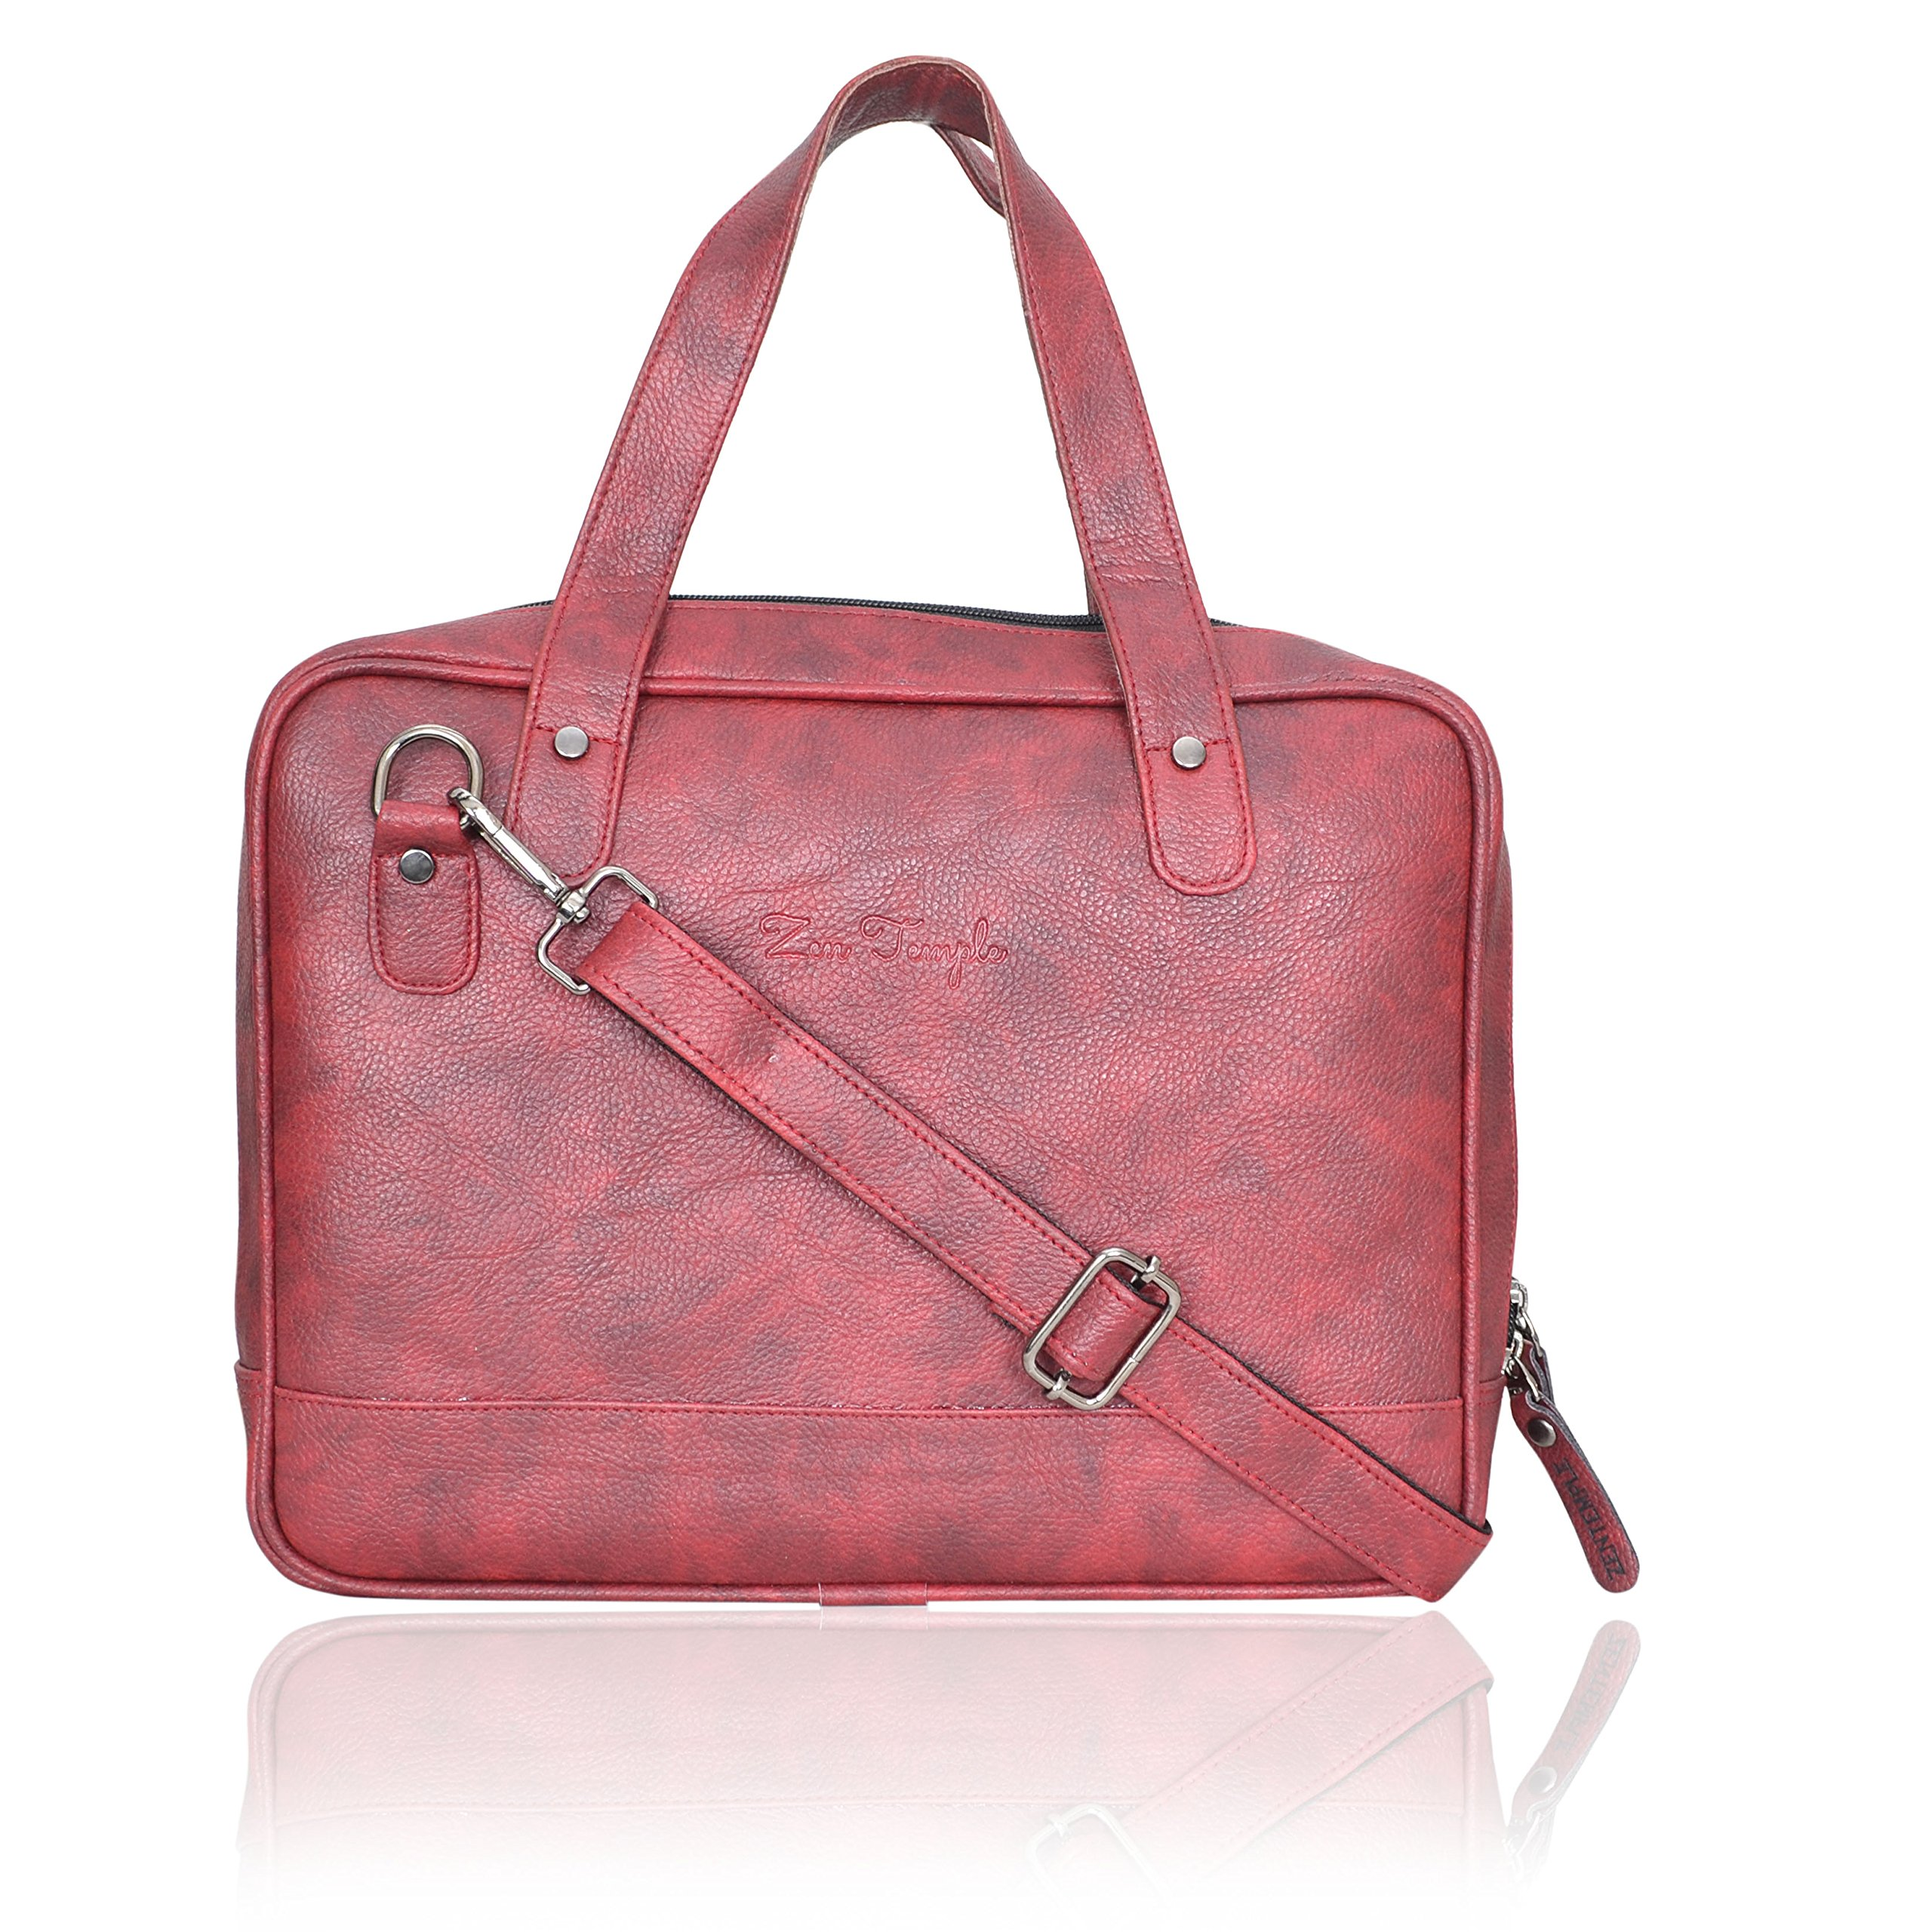 Zen Temple Handmade Briefcase Top Grain Leather Laptop Bag Messenger Shoulder Bag for Business Office 11 inch laptop